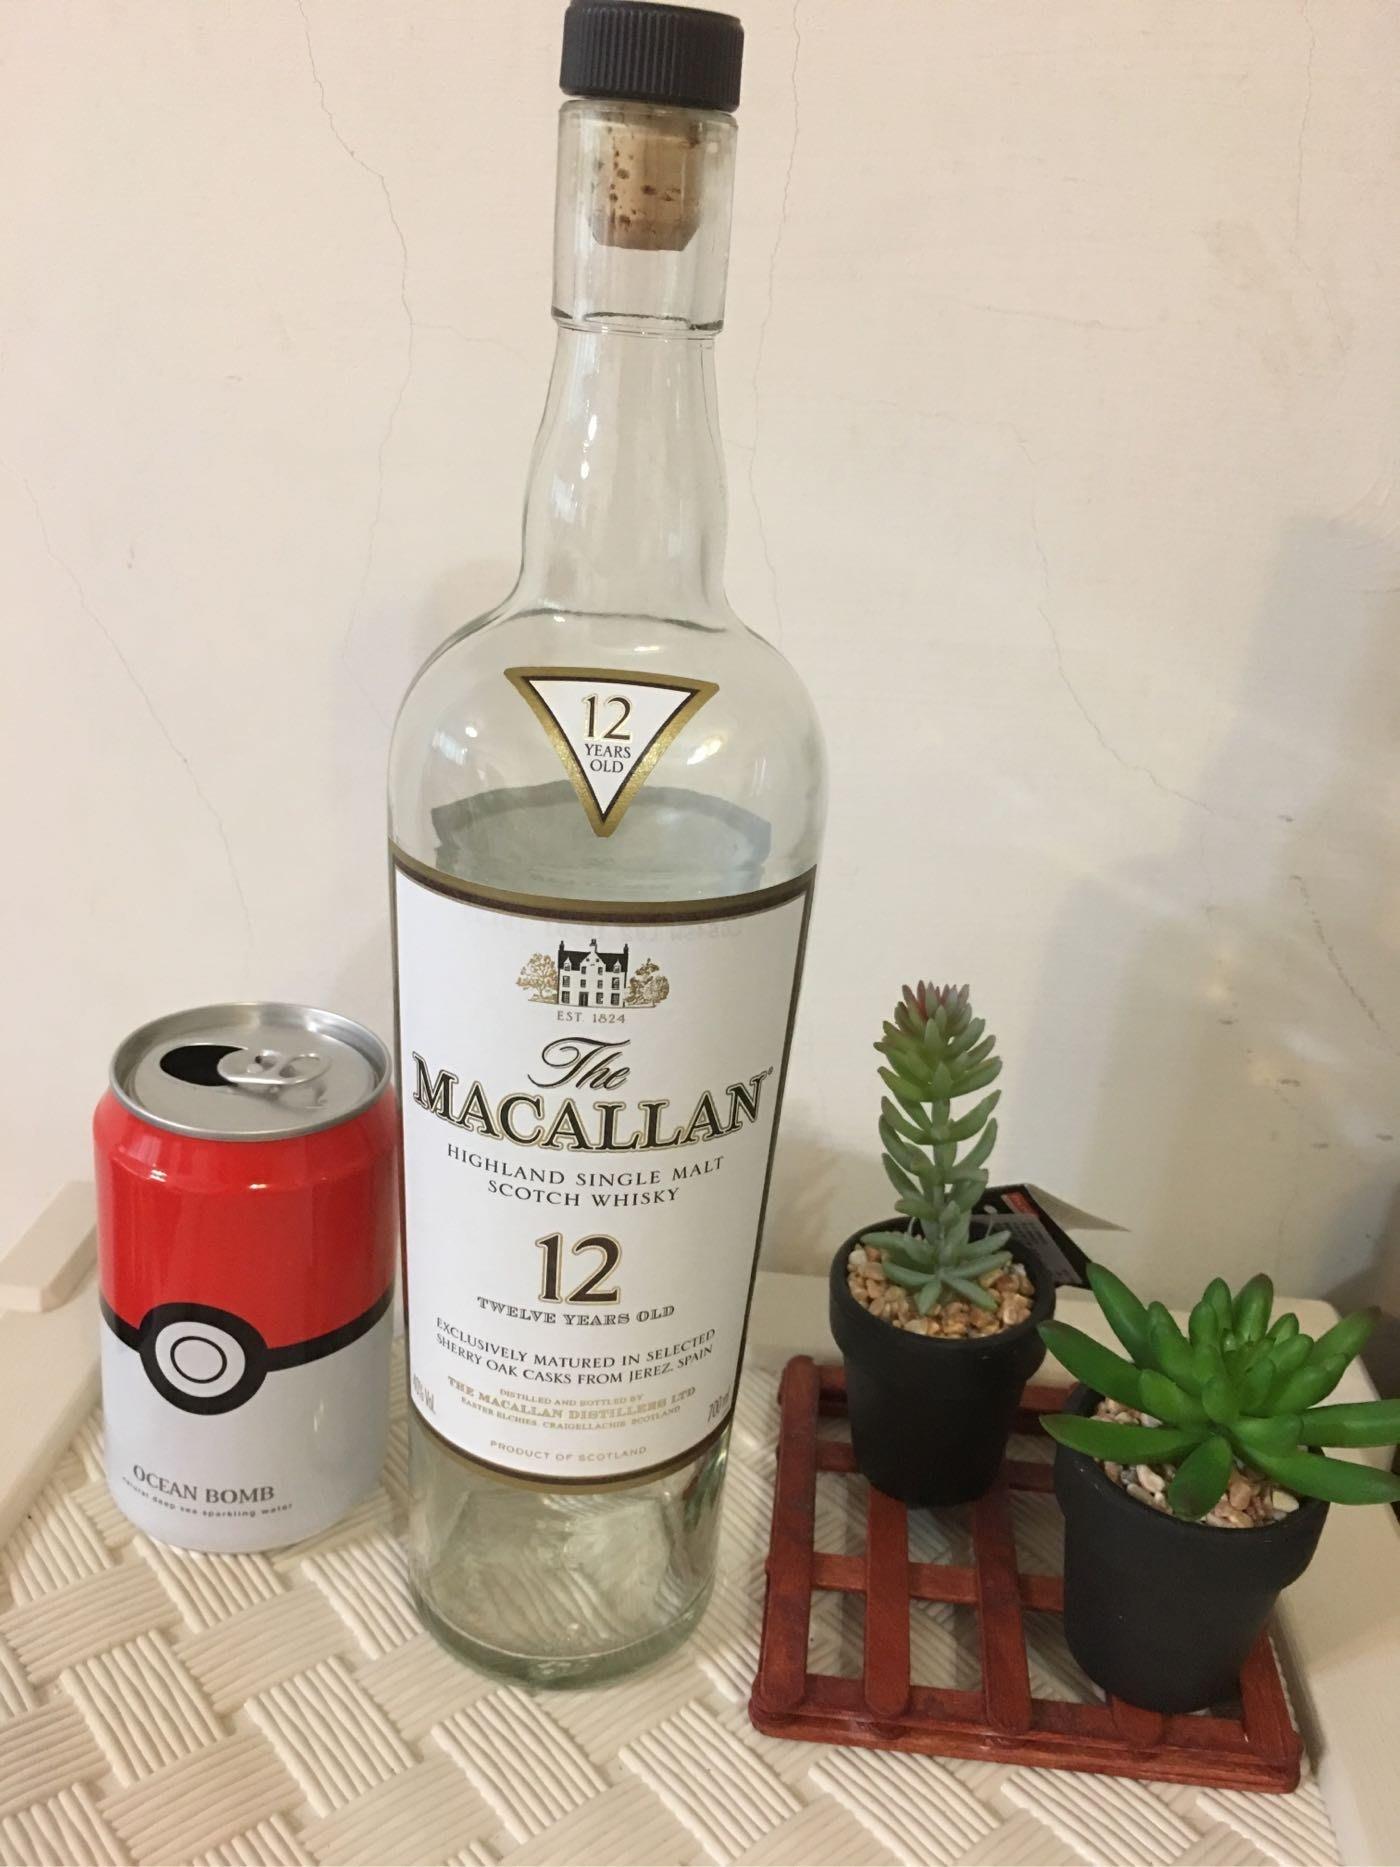 《Nice》蘇格蘭 麥卡倫 12年經典雪莉桶 單一純麥威士忌-空酒瓶 700ml